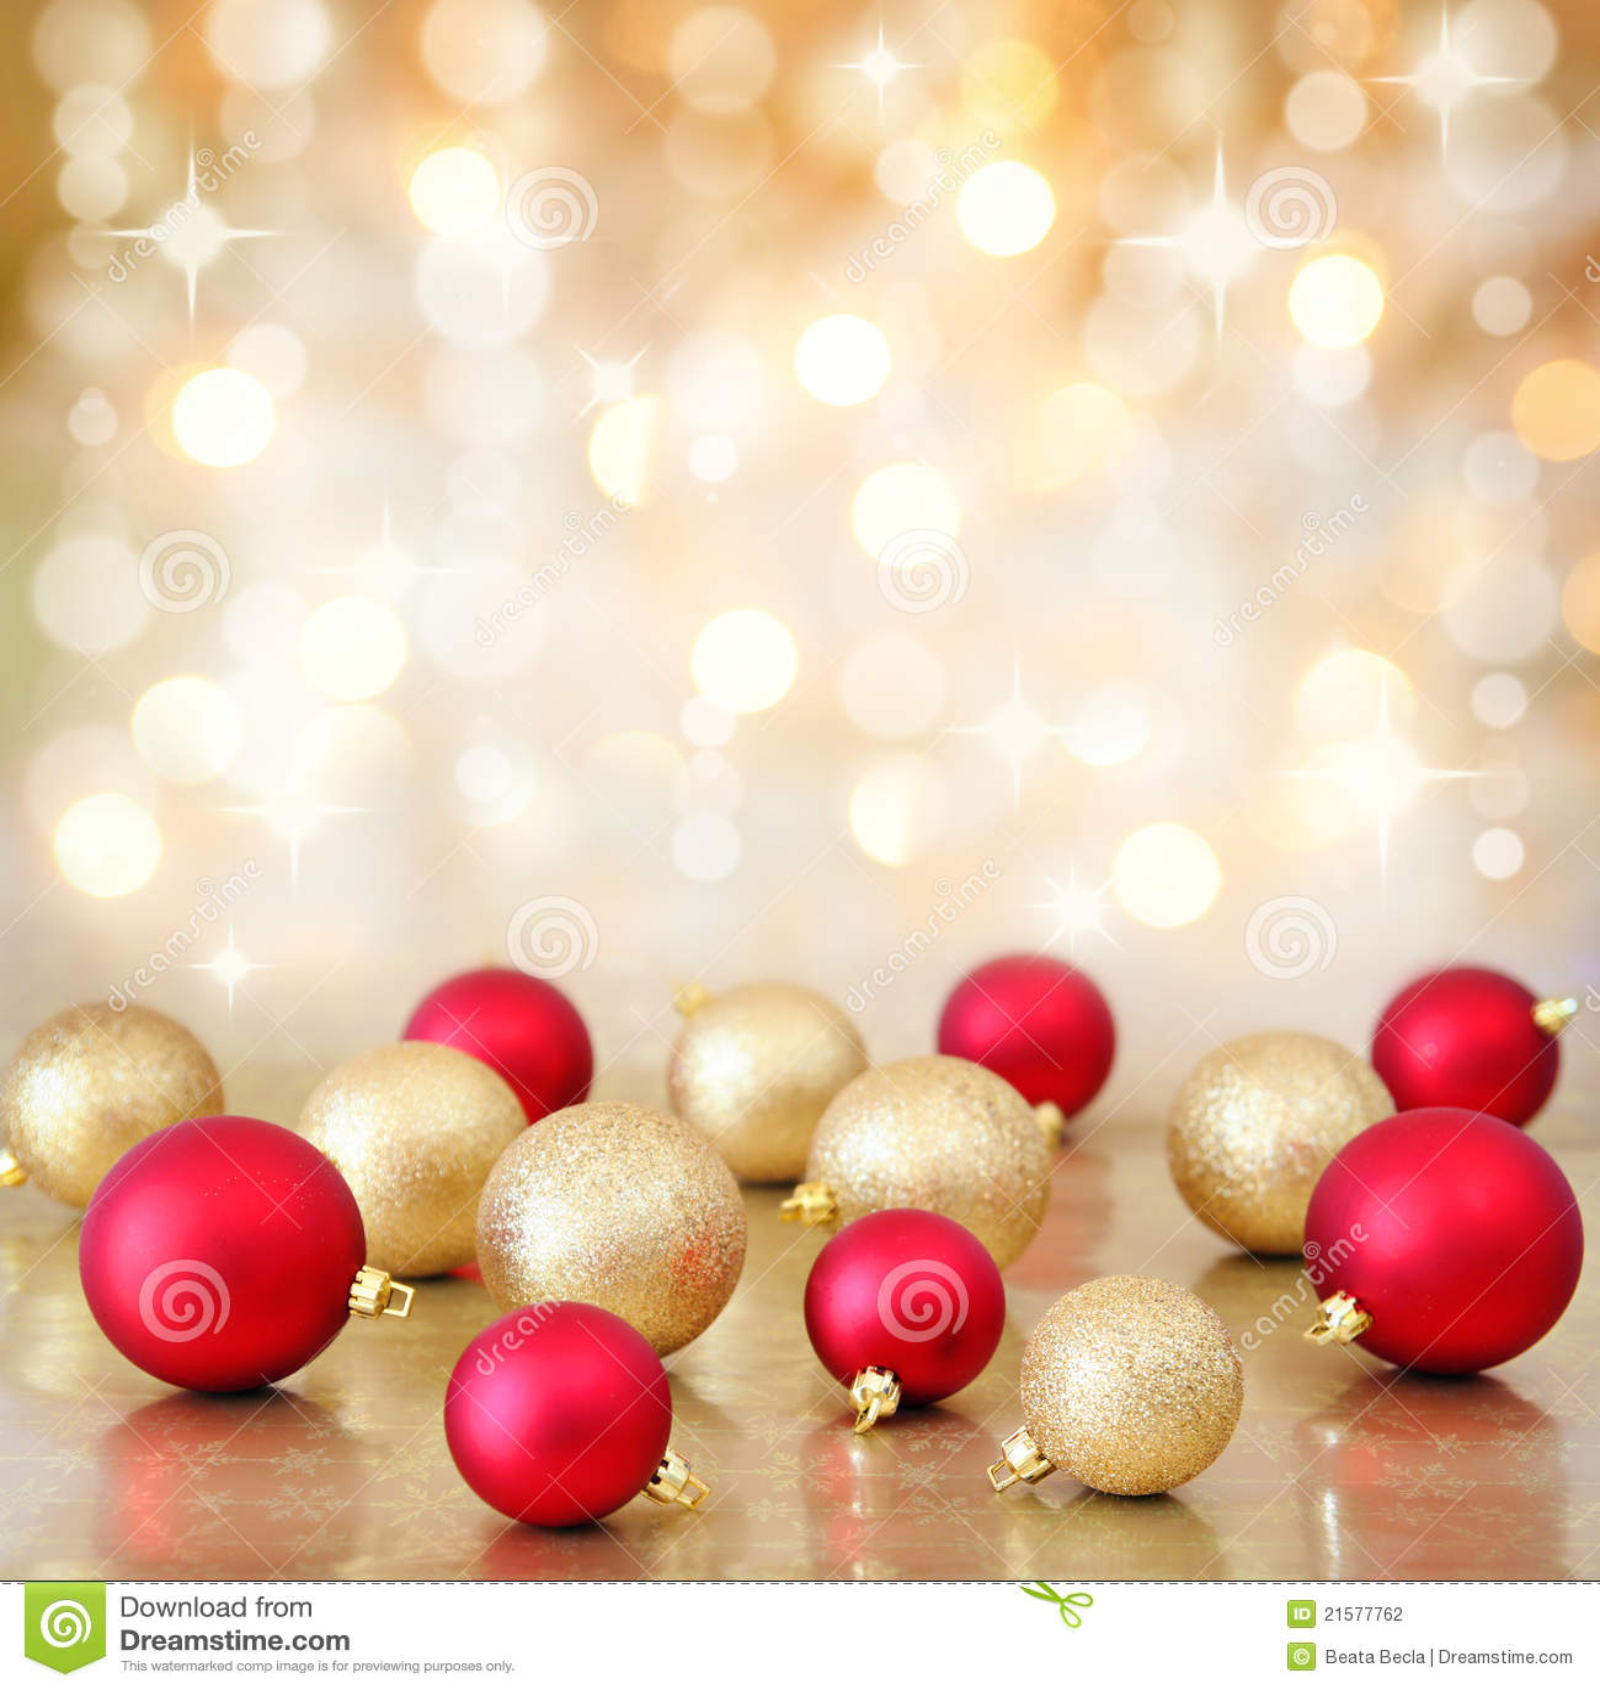 Christmas Baubles On Defocused Lights Background Stock Photo - Image ...